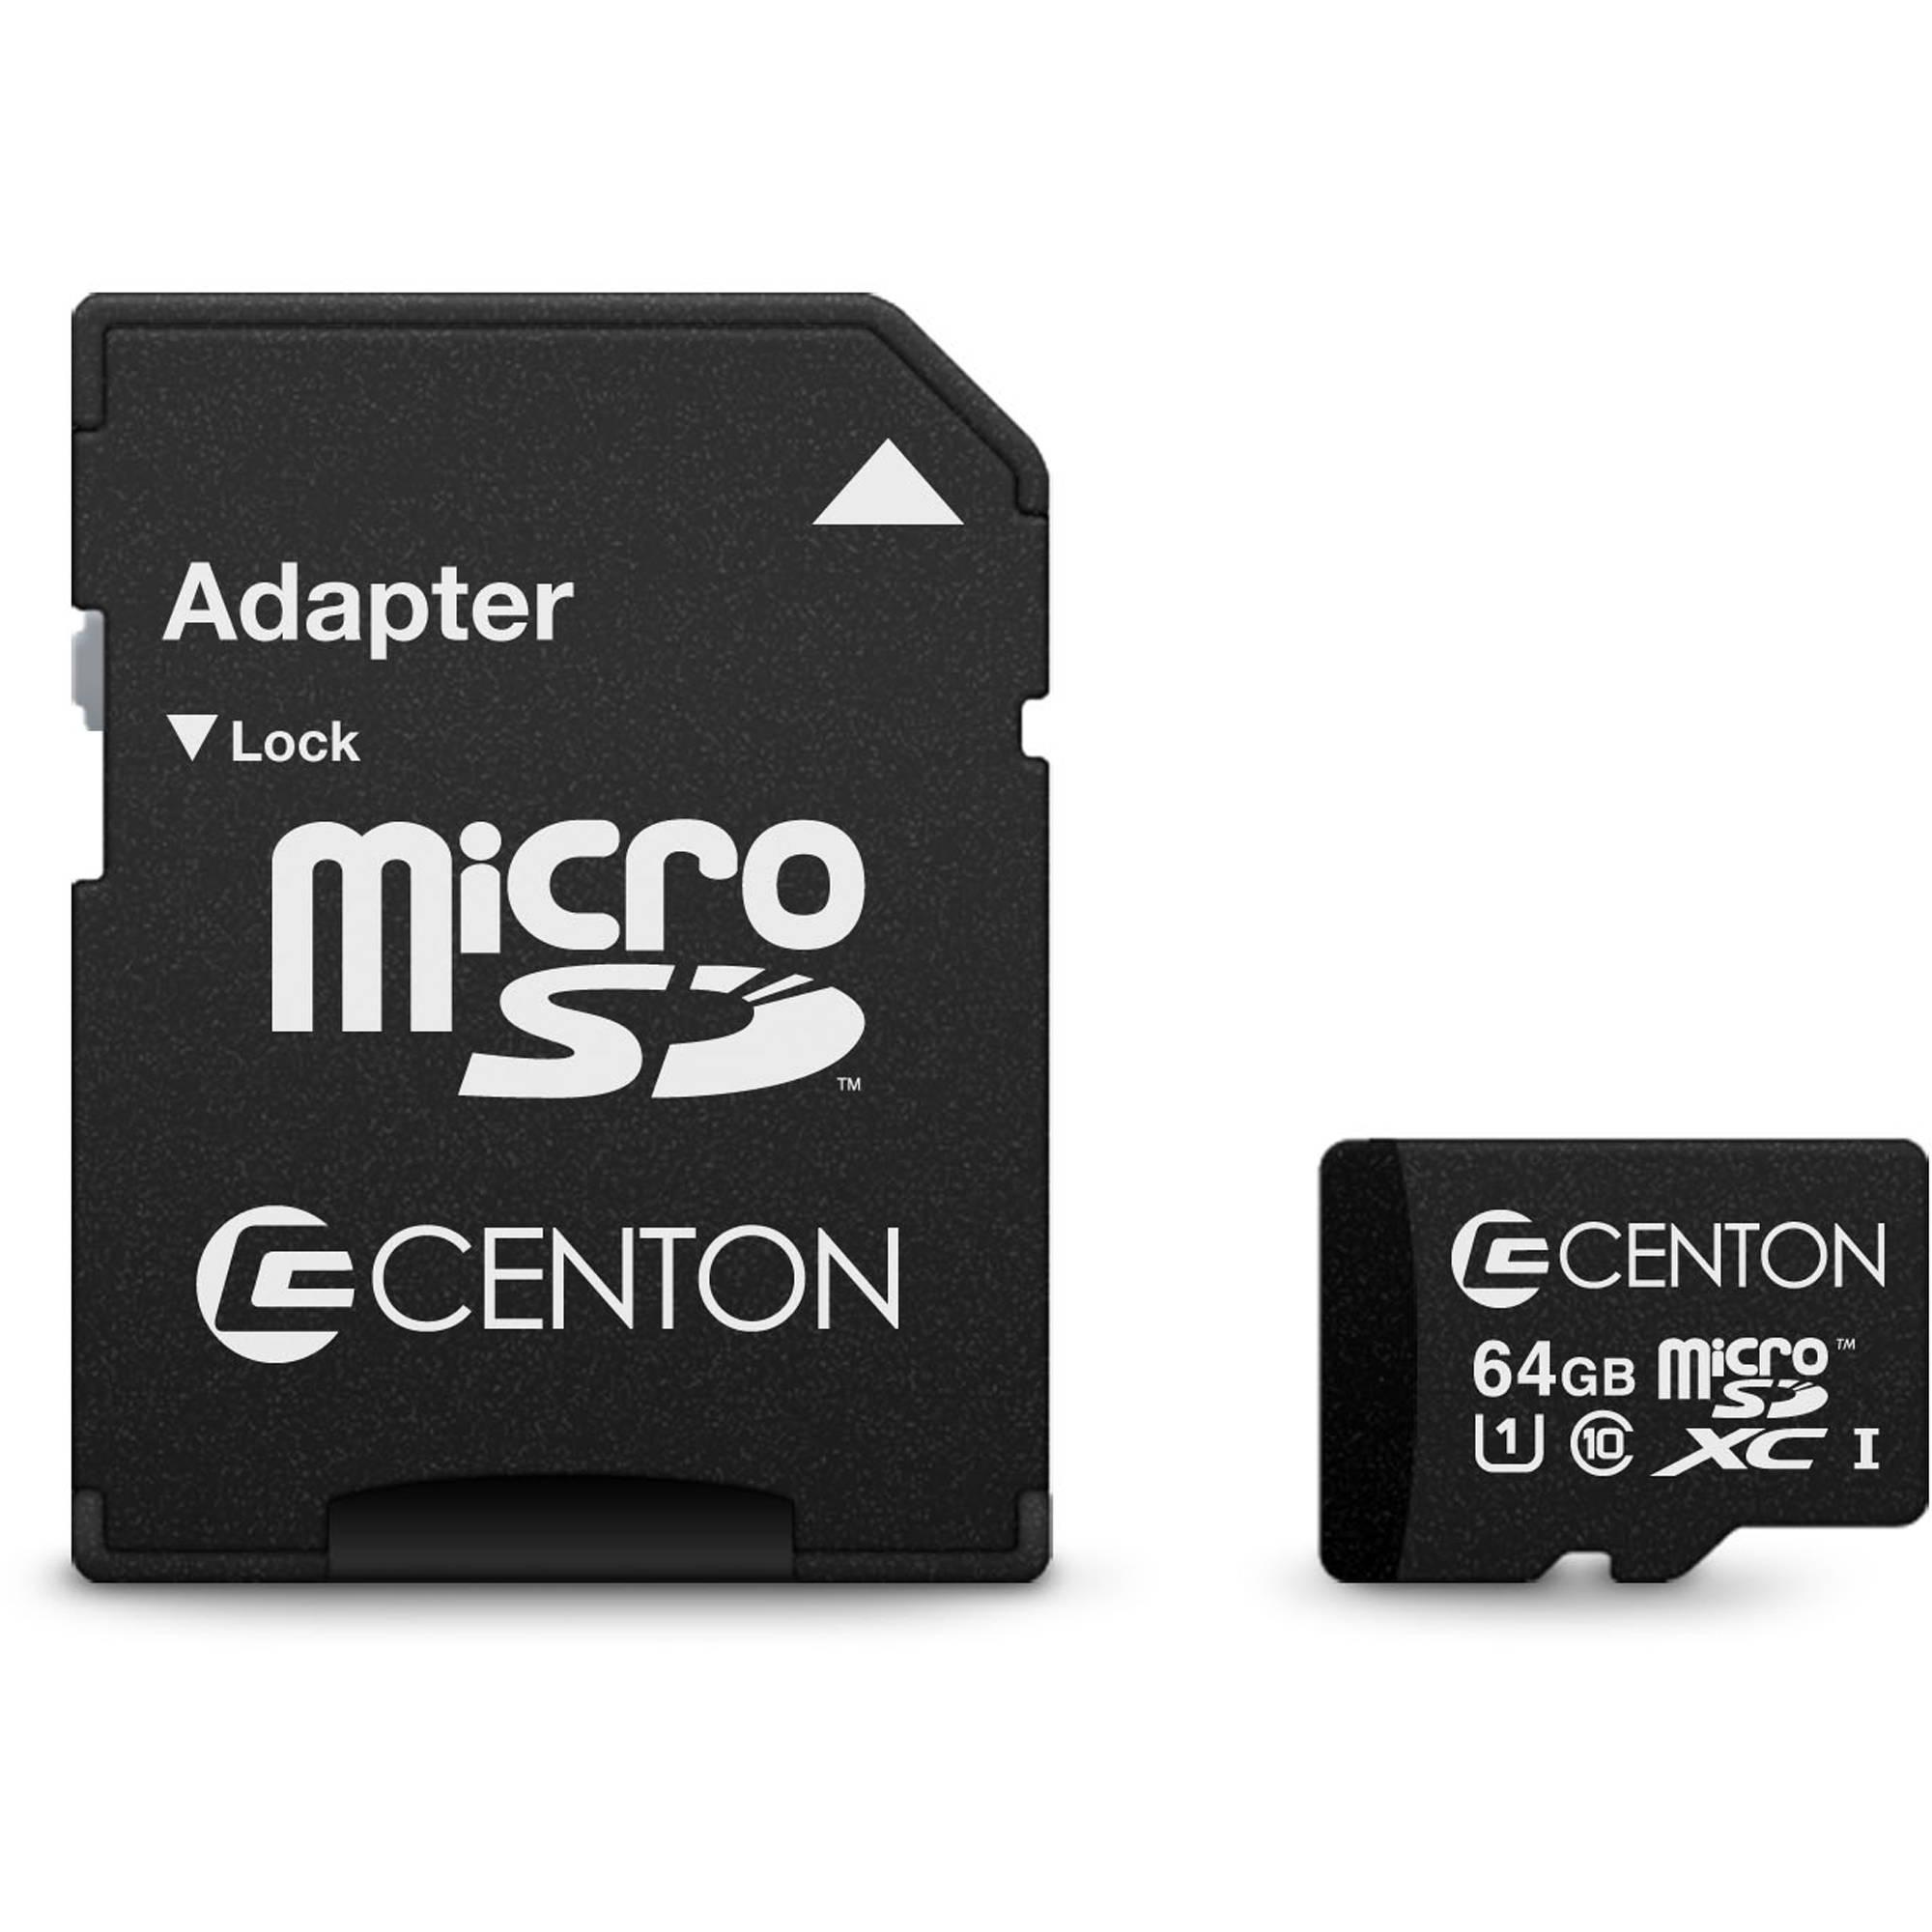 Centon 64GB Class 10 UHS-I microSDXC Card